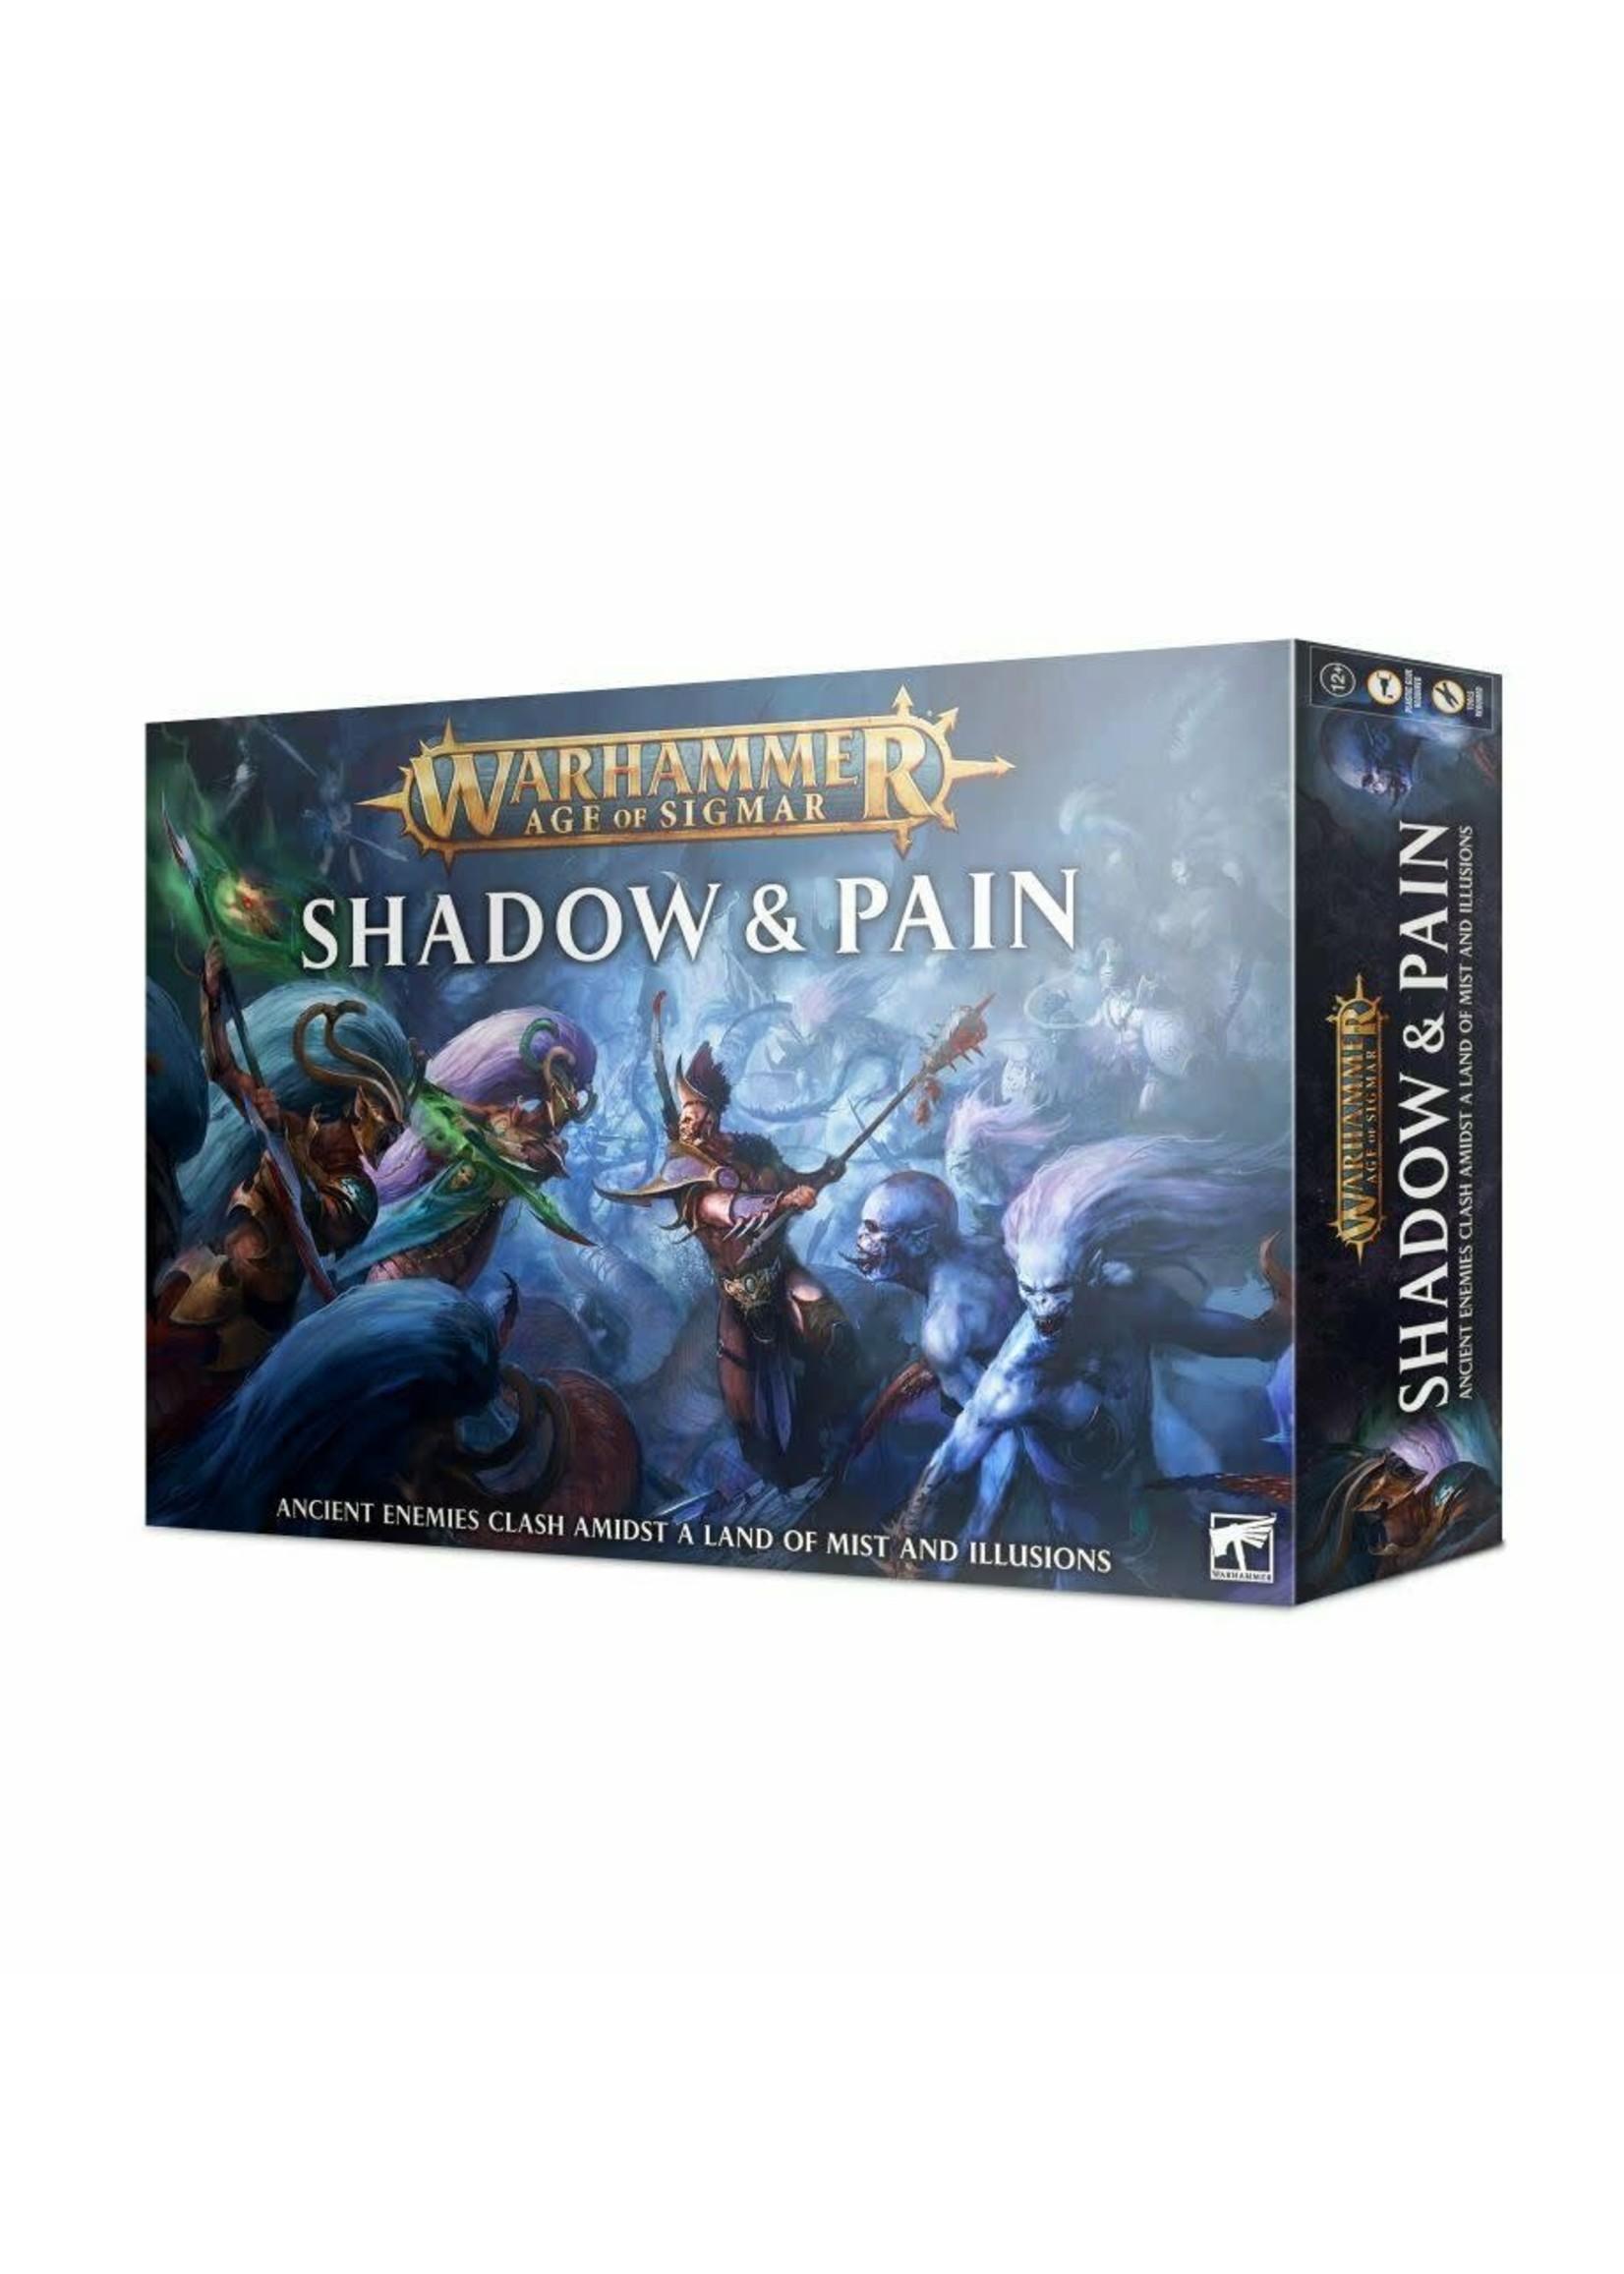 Warhammer: Age of Sigmar Shadow and Pain Box